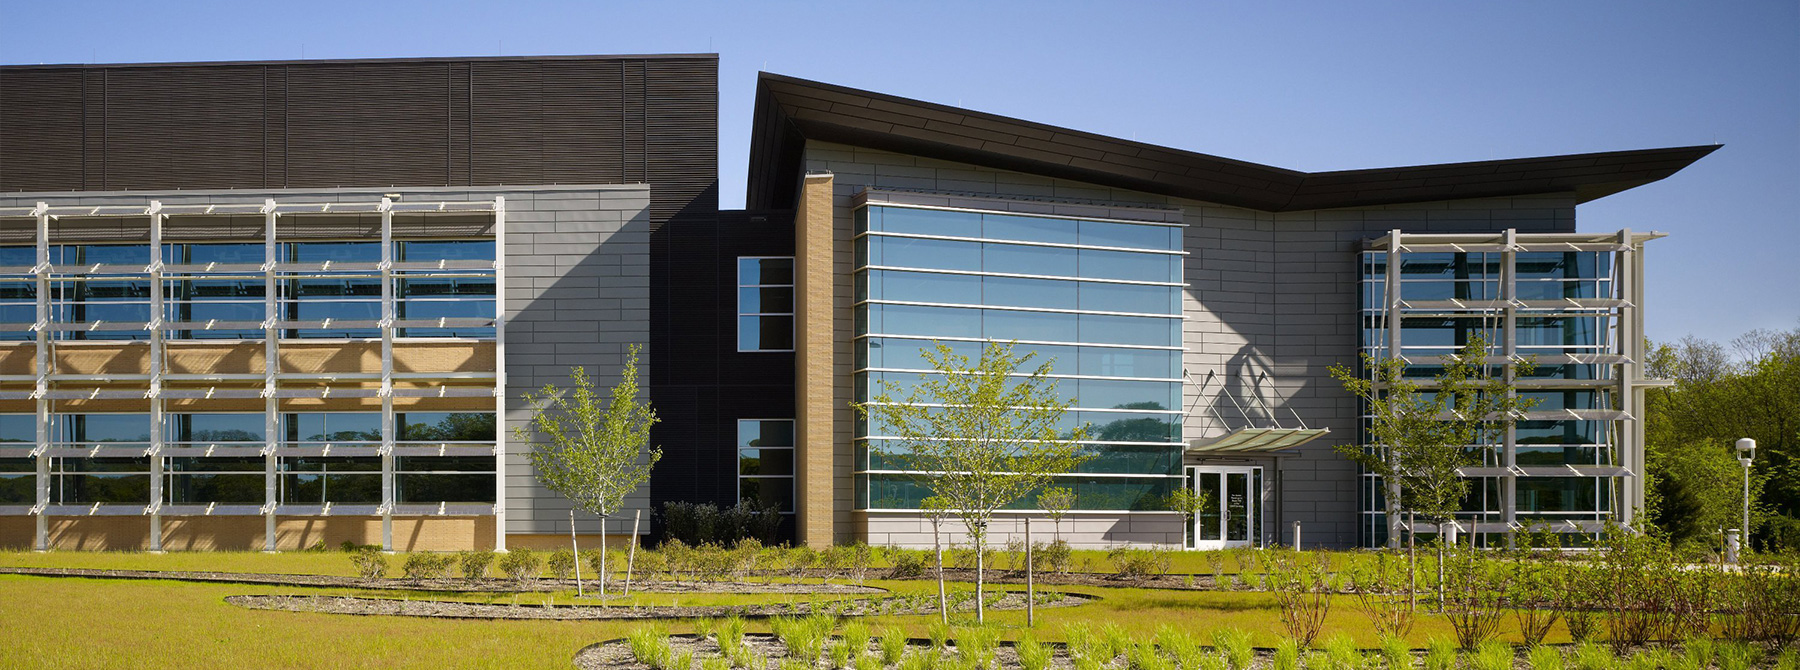 Flad Architects : Stony Brook University, Advanced Energy Center